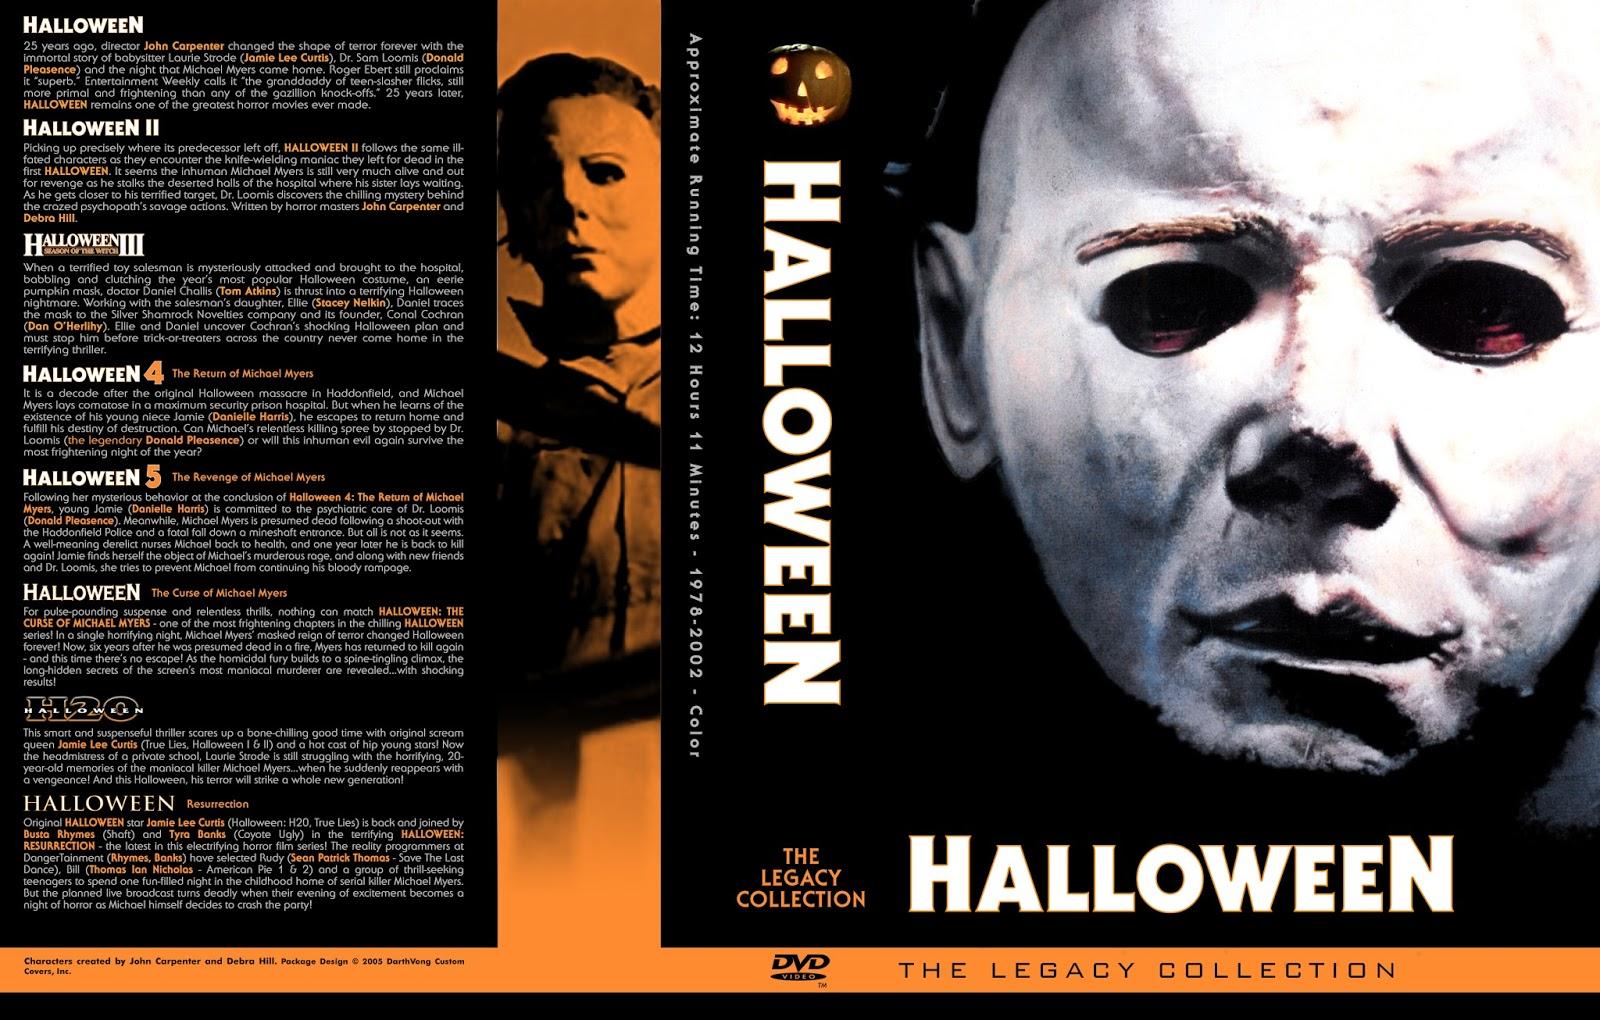 The Horrors of Halloween: HALLOWEEN Franchise (1978-2009) Boxset ...